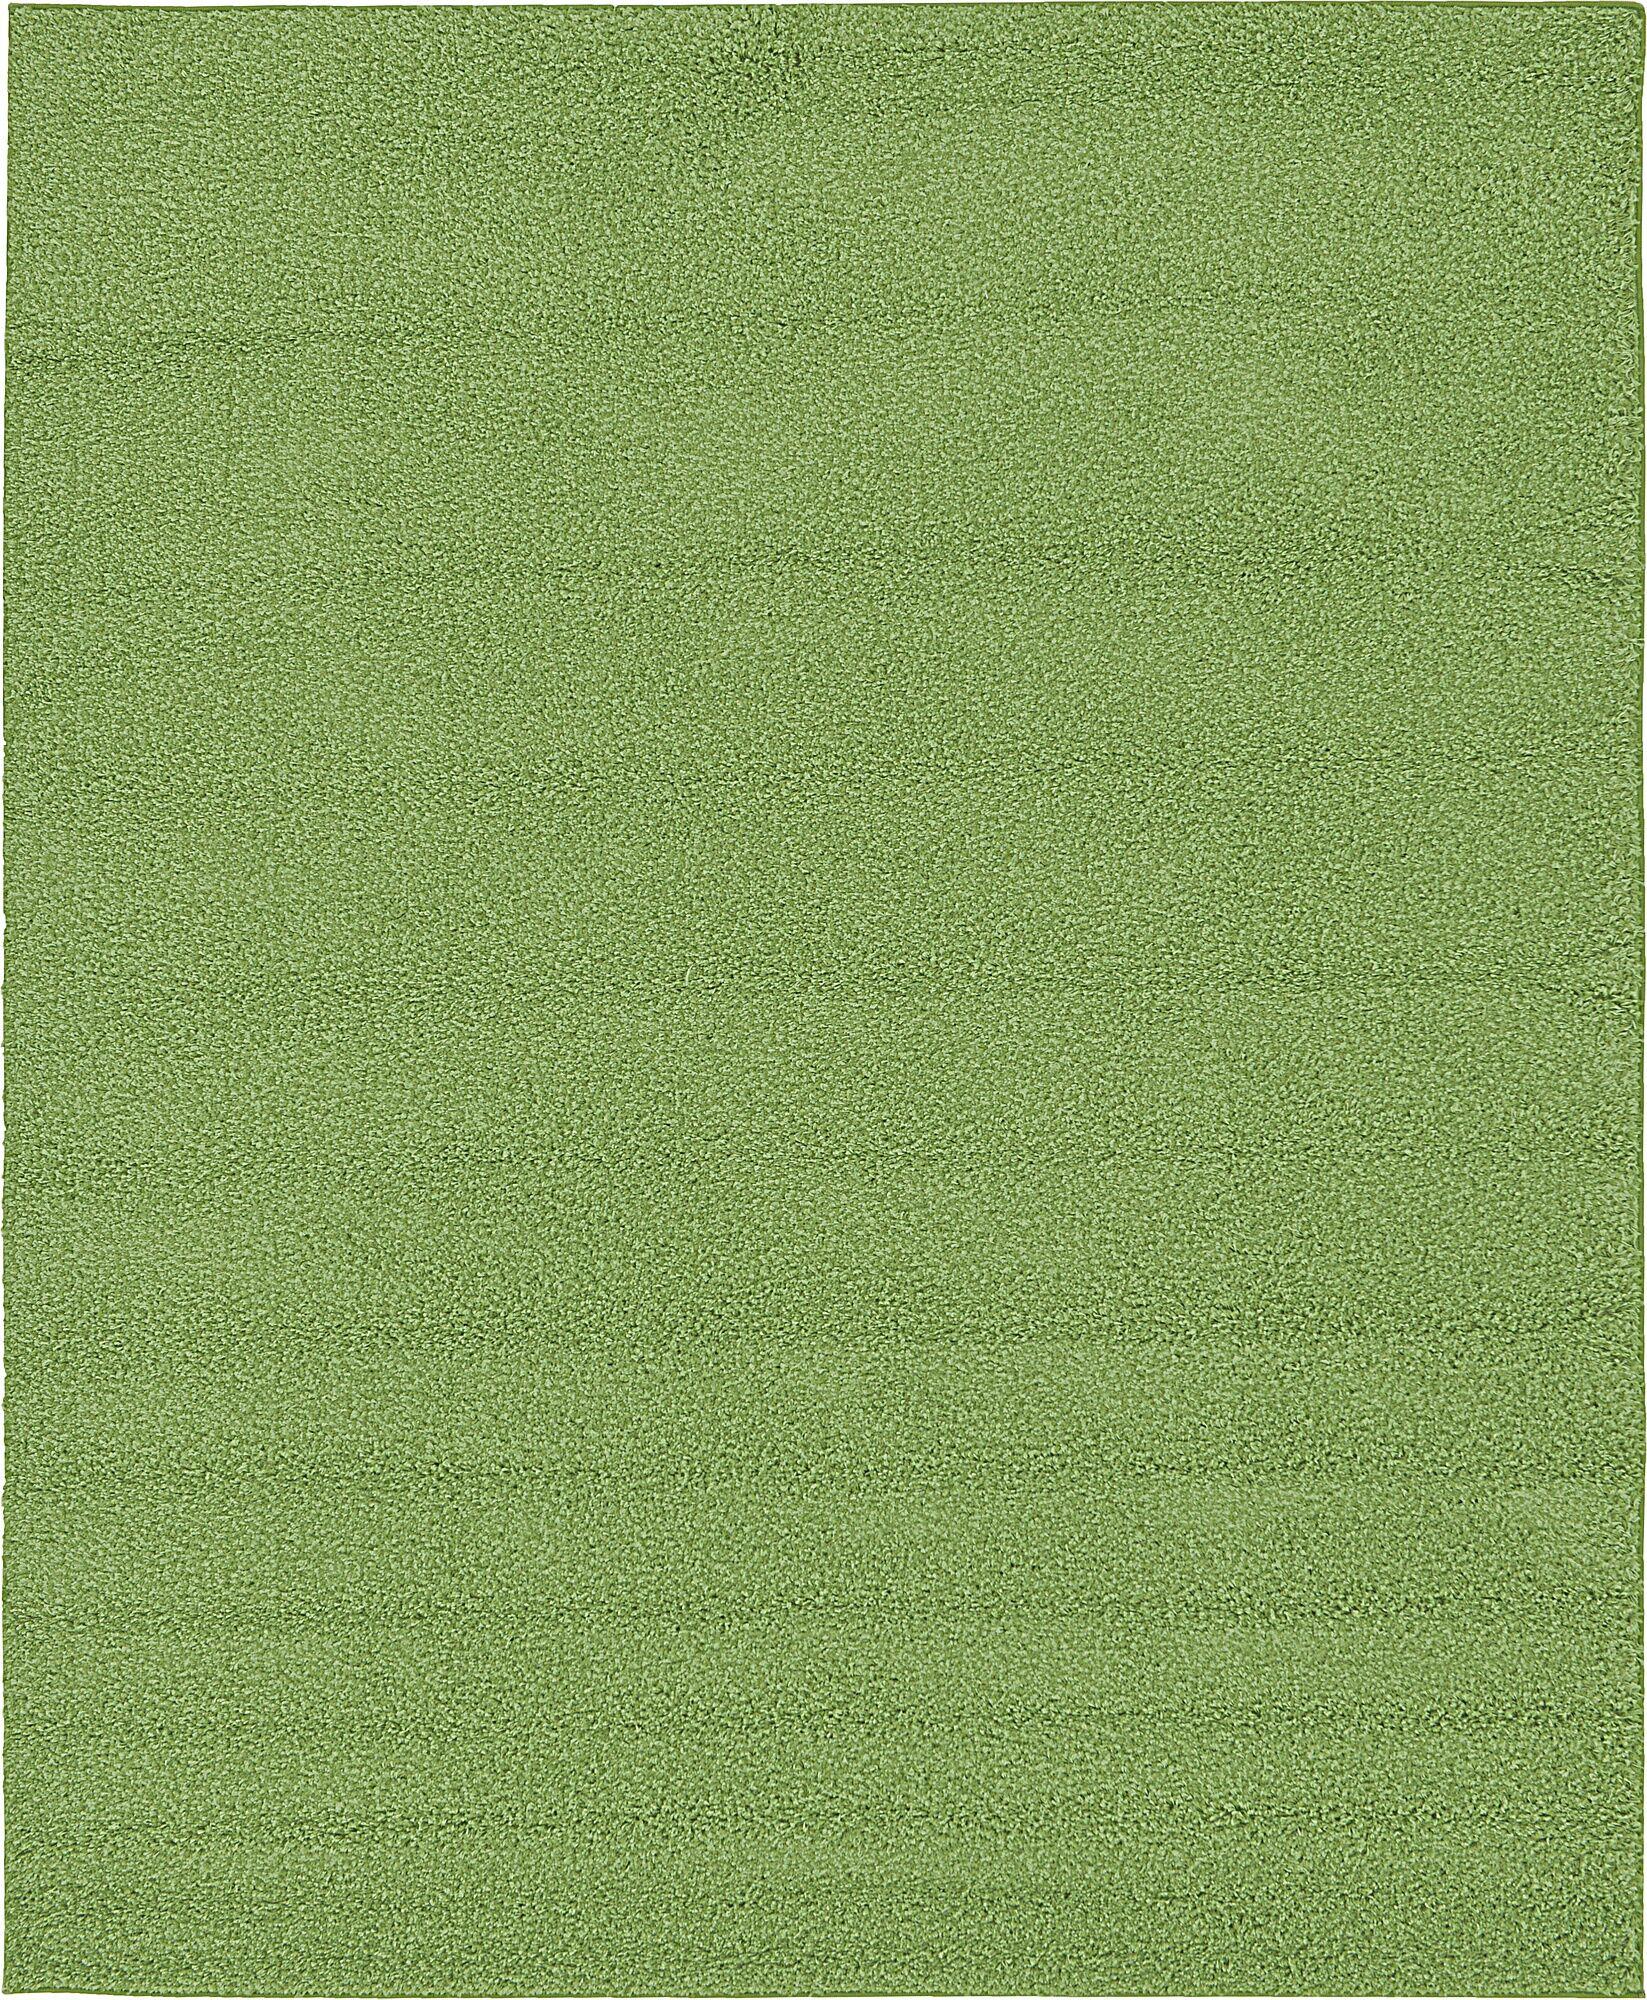 Sellman Green Area Rug Rug Size: Rectangle 5' x 7'10